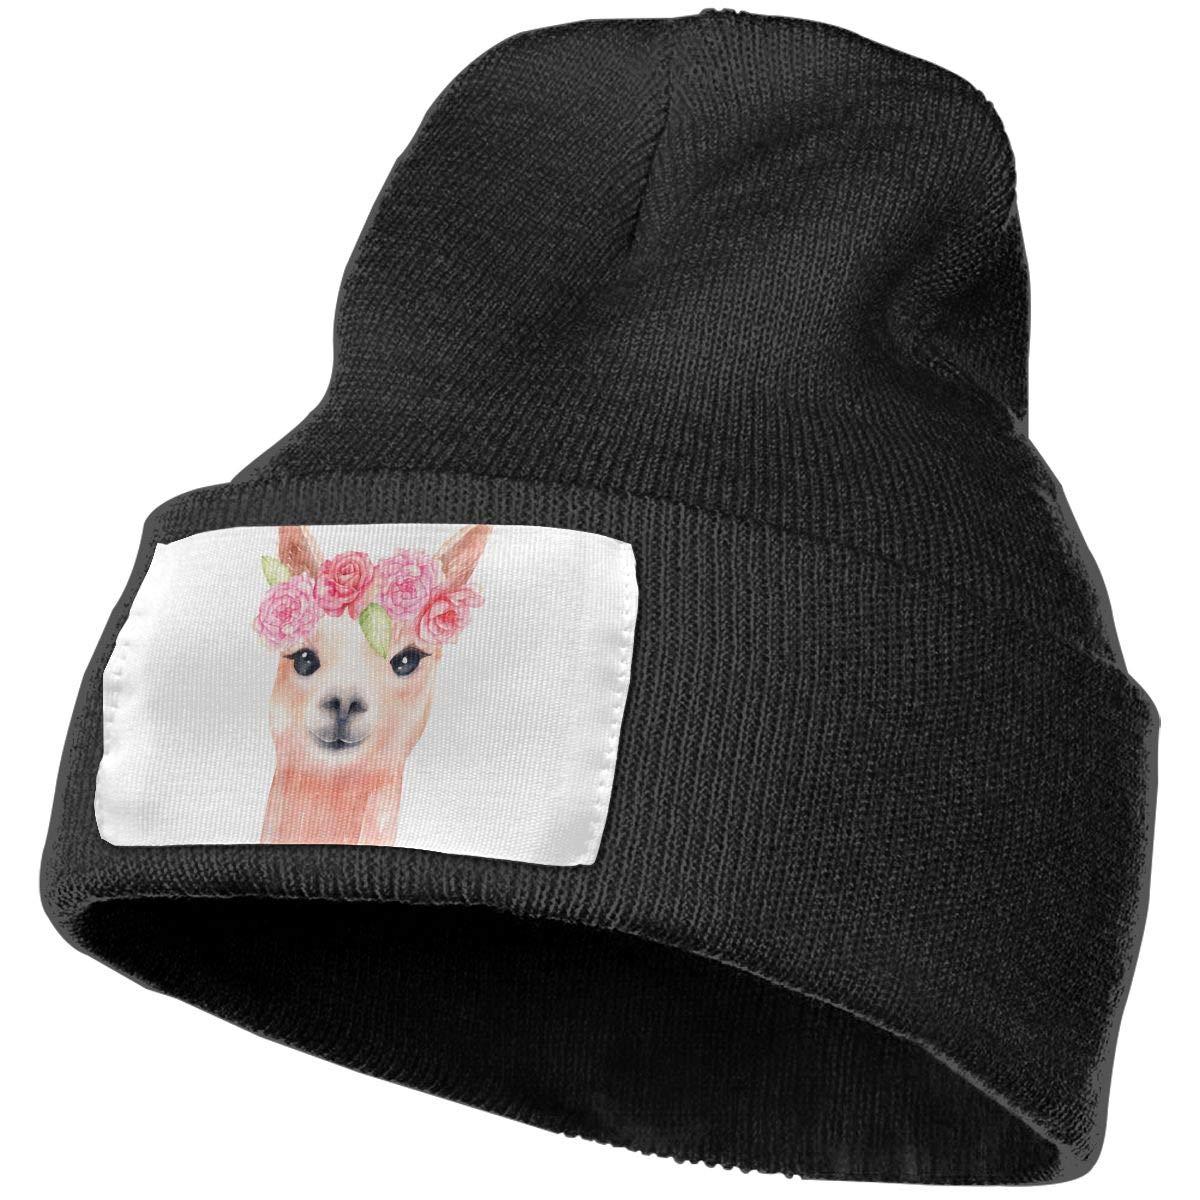 QZqDQ Llamacorn Unisex Fashion Knitted Hat Luxury Hip-Hop Cap